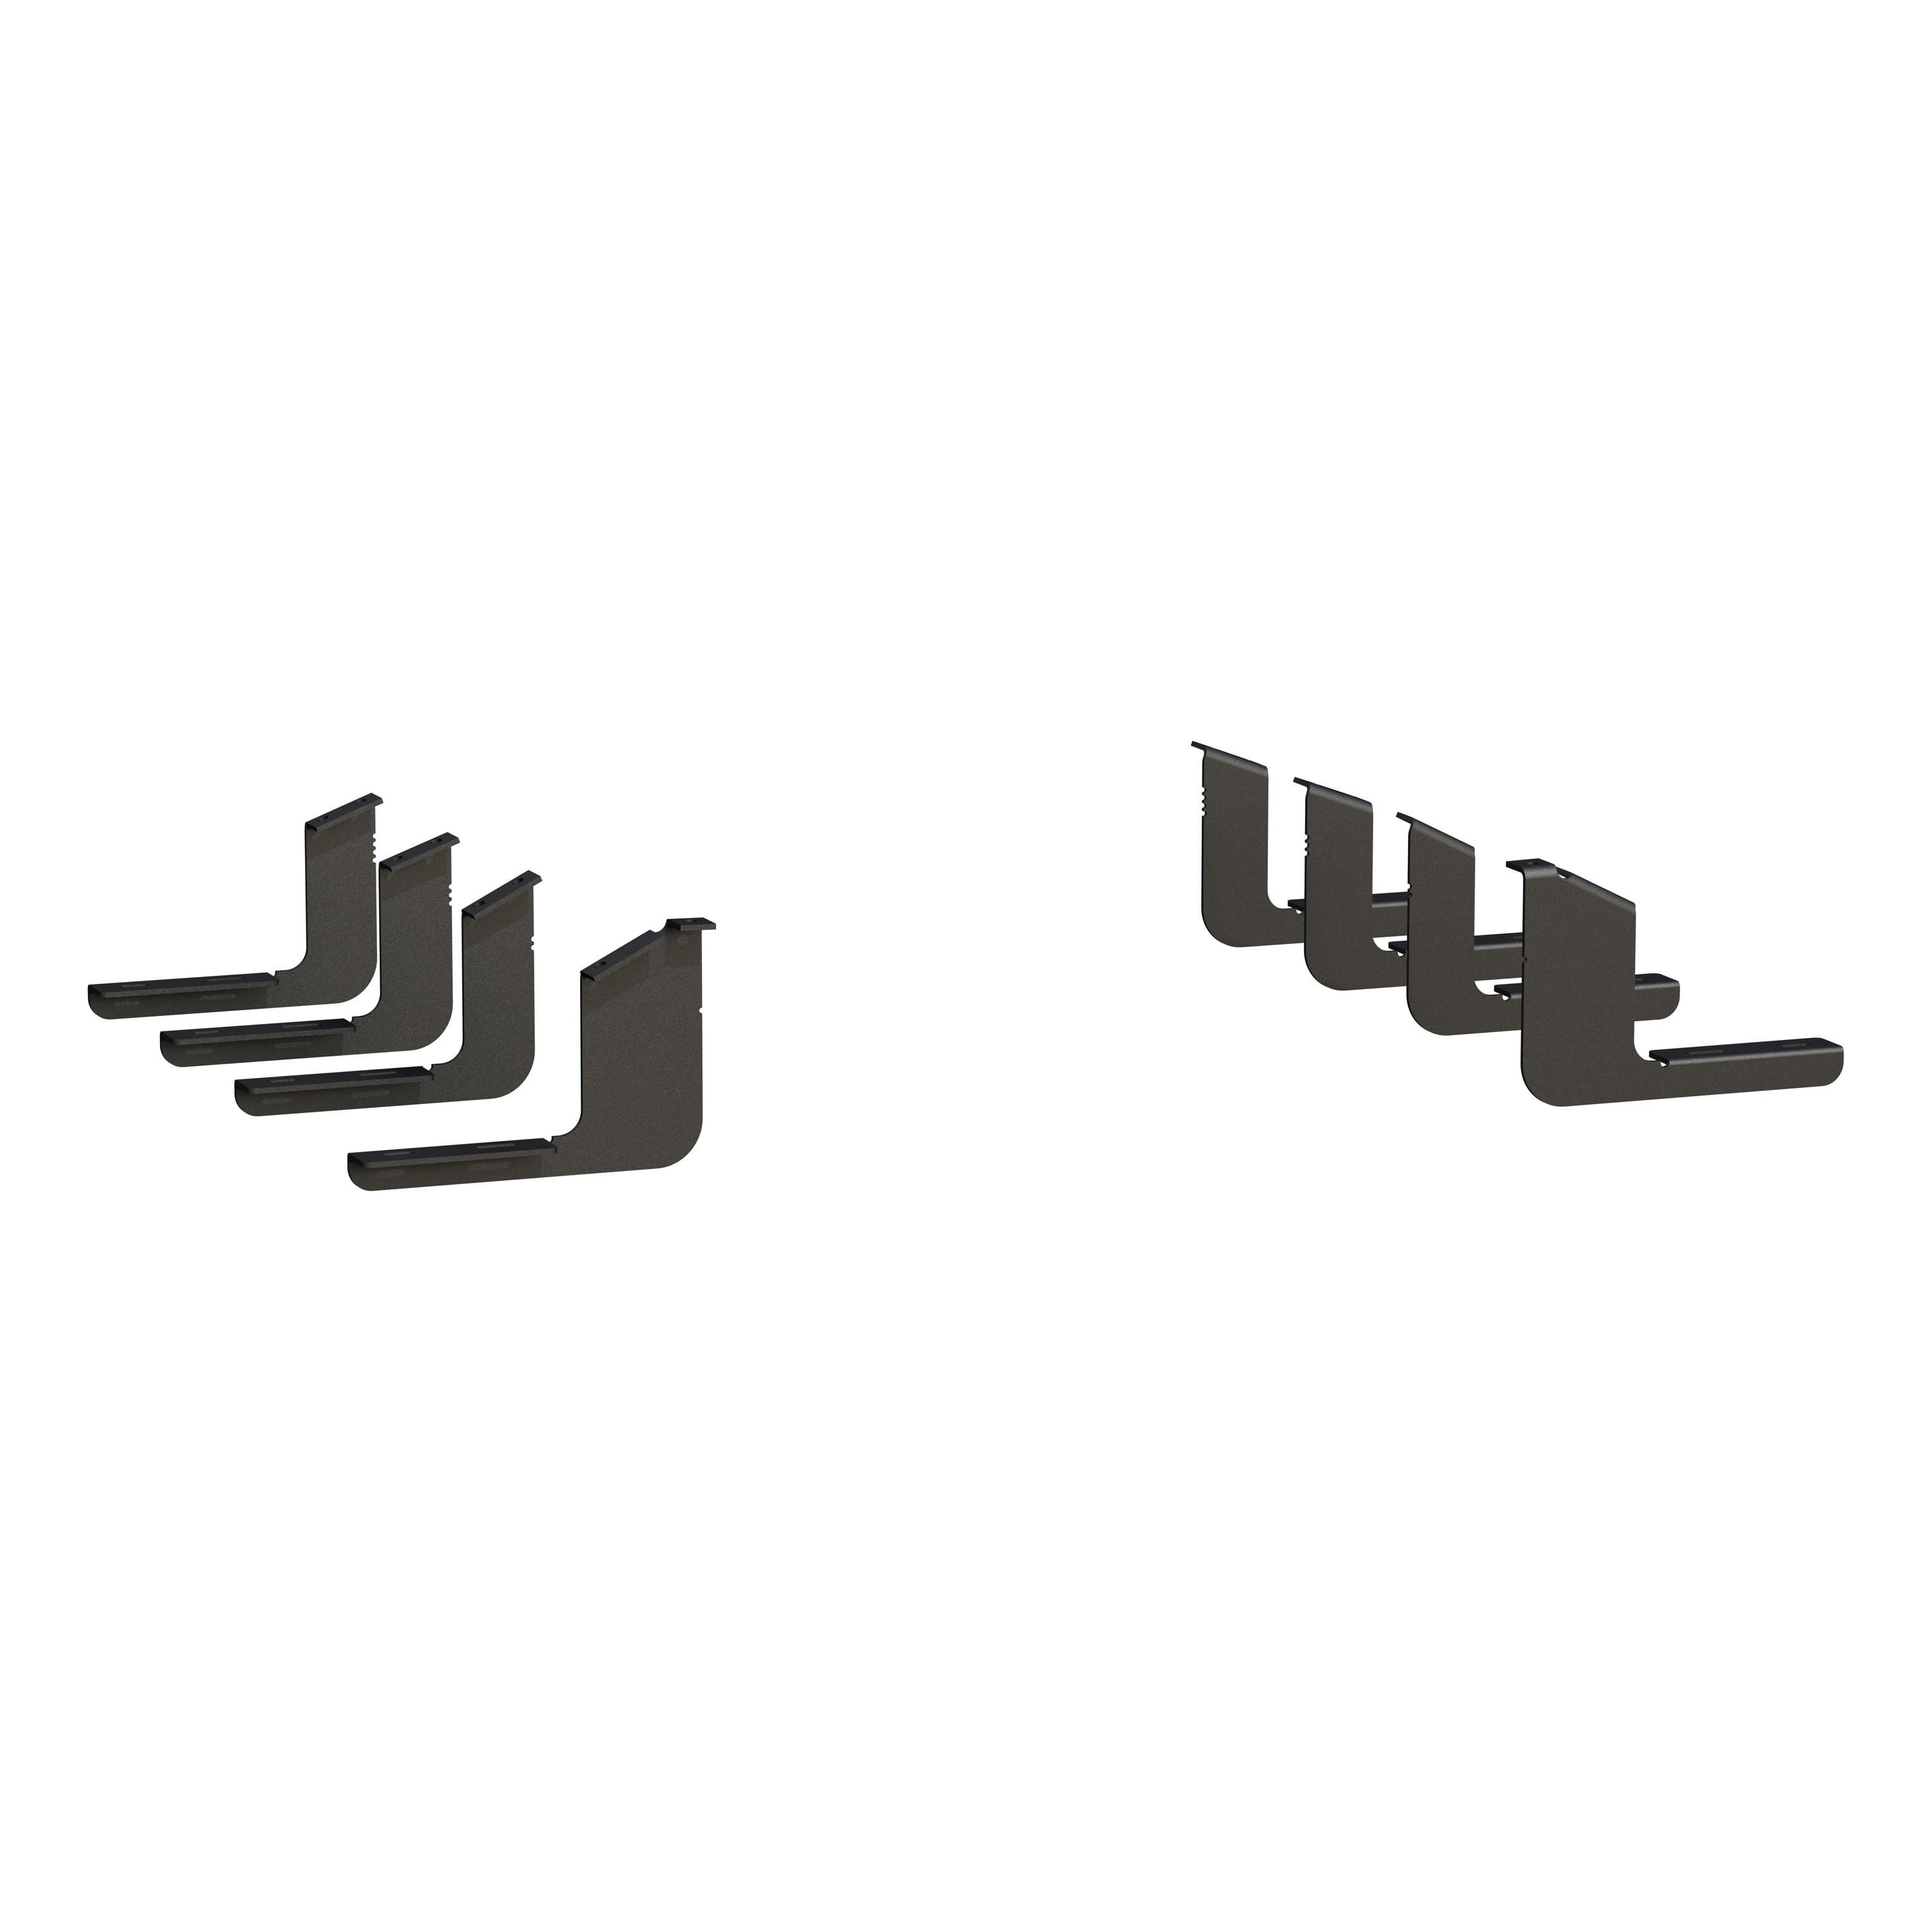 Luverne 400752 Running Board Mounting Kit  Rocker Panel Mount; For Grip Step Boards And Regal 7 Bars - image 1 de 1